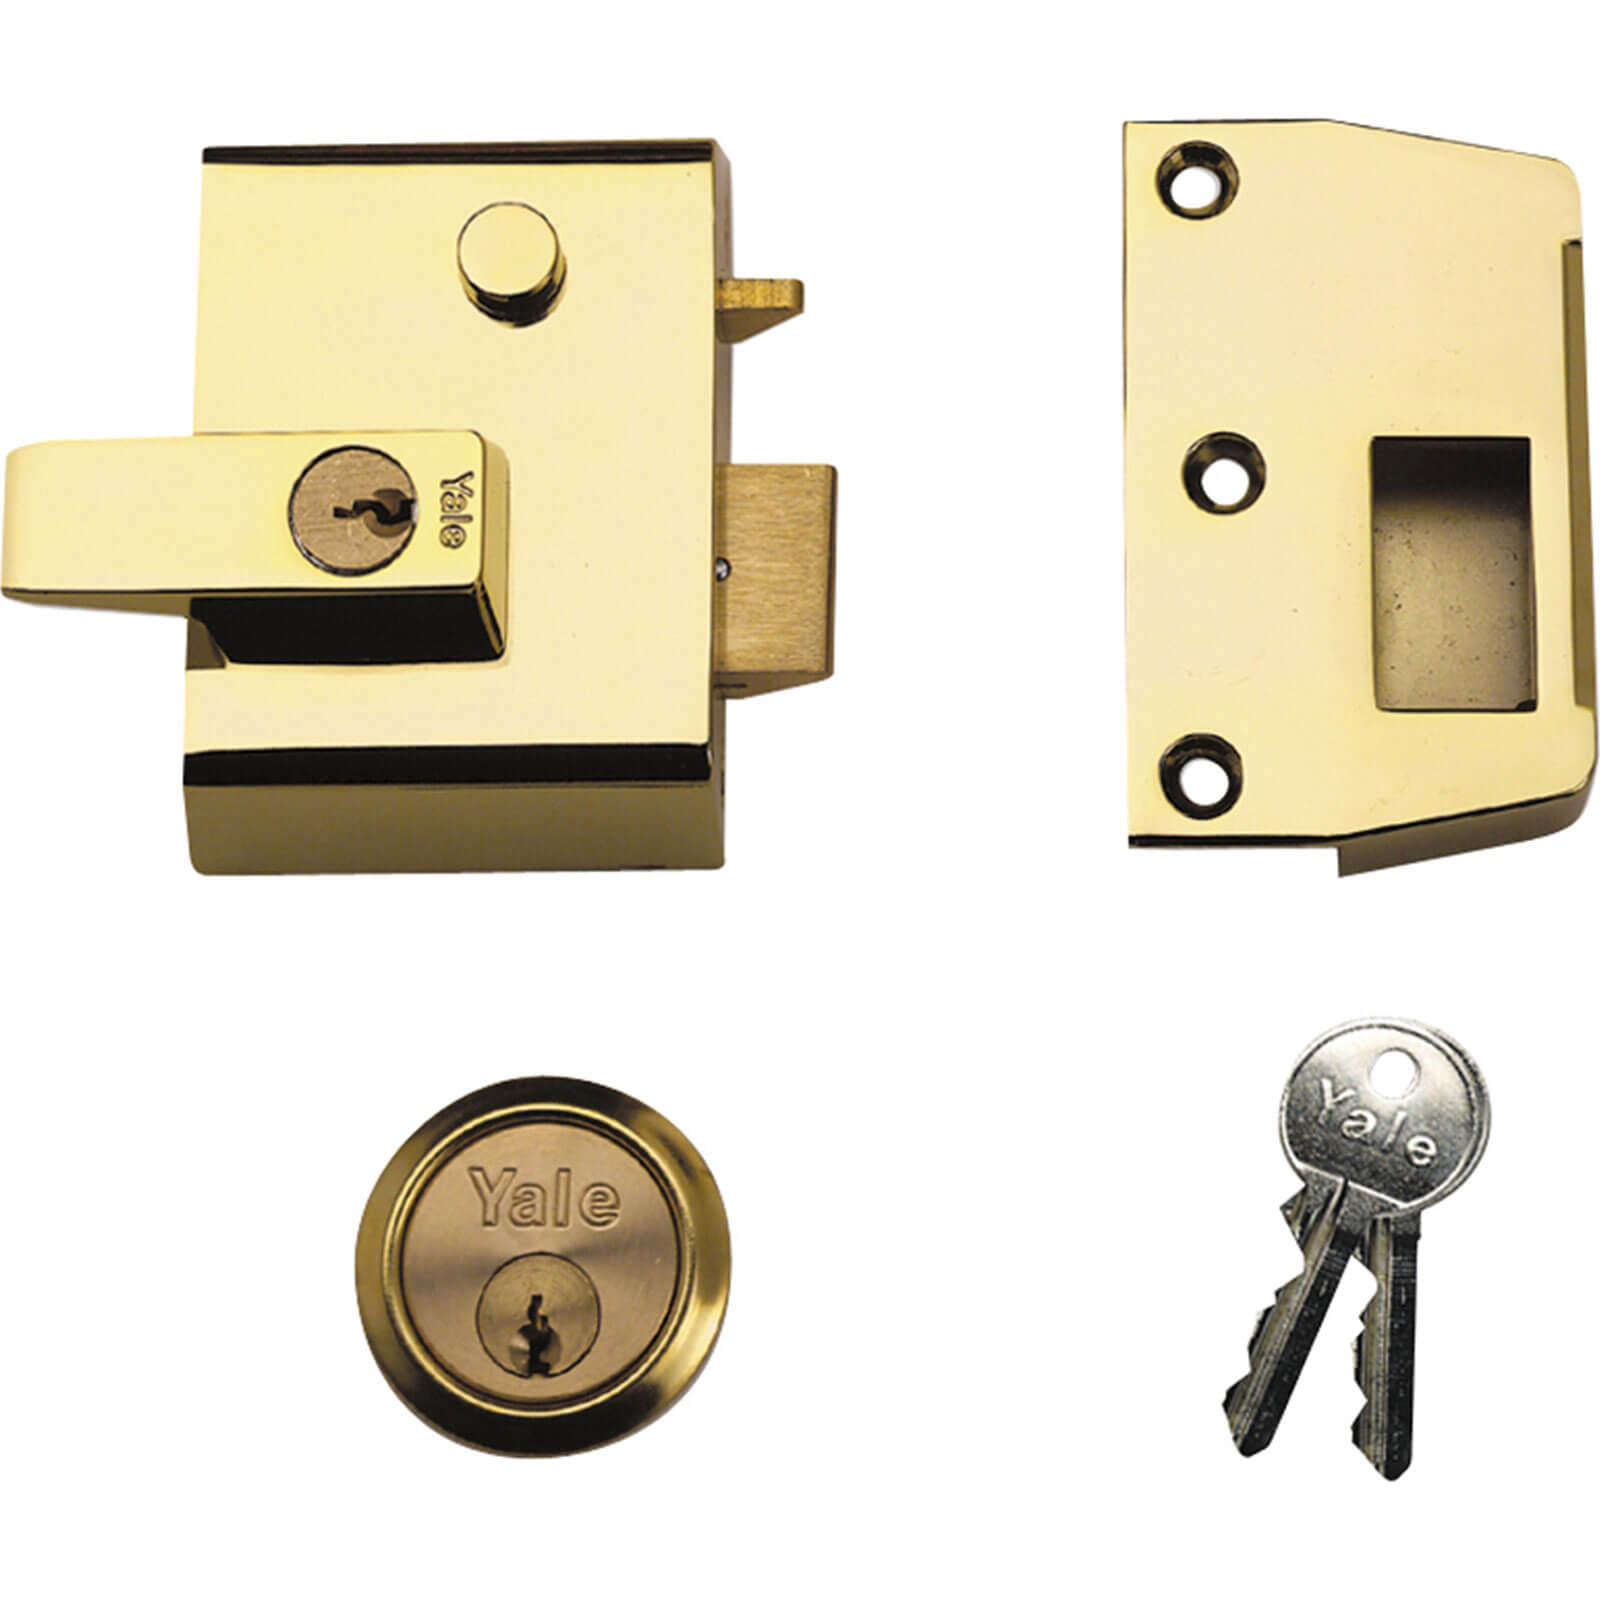 Yale Locks P2 Double Security Nightlatch Brasslux Finish 40mm Backset